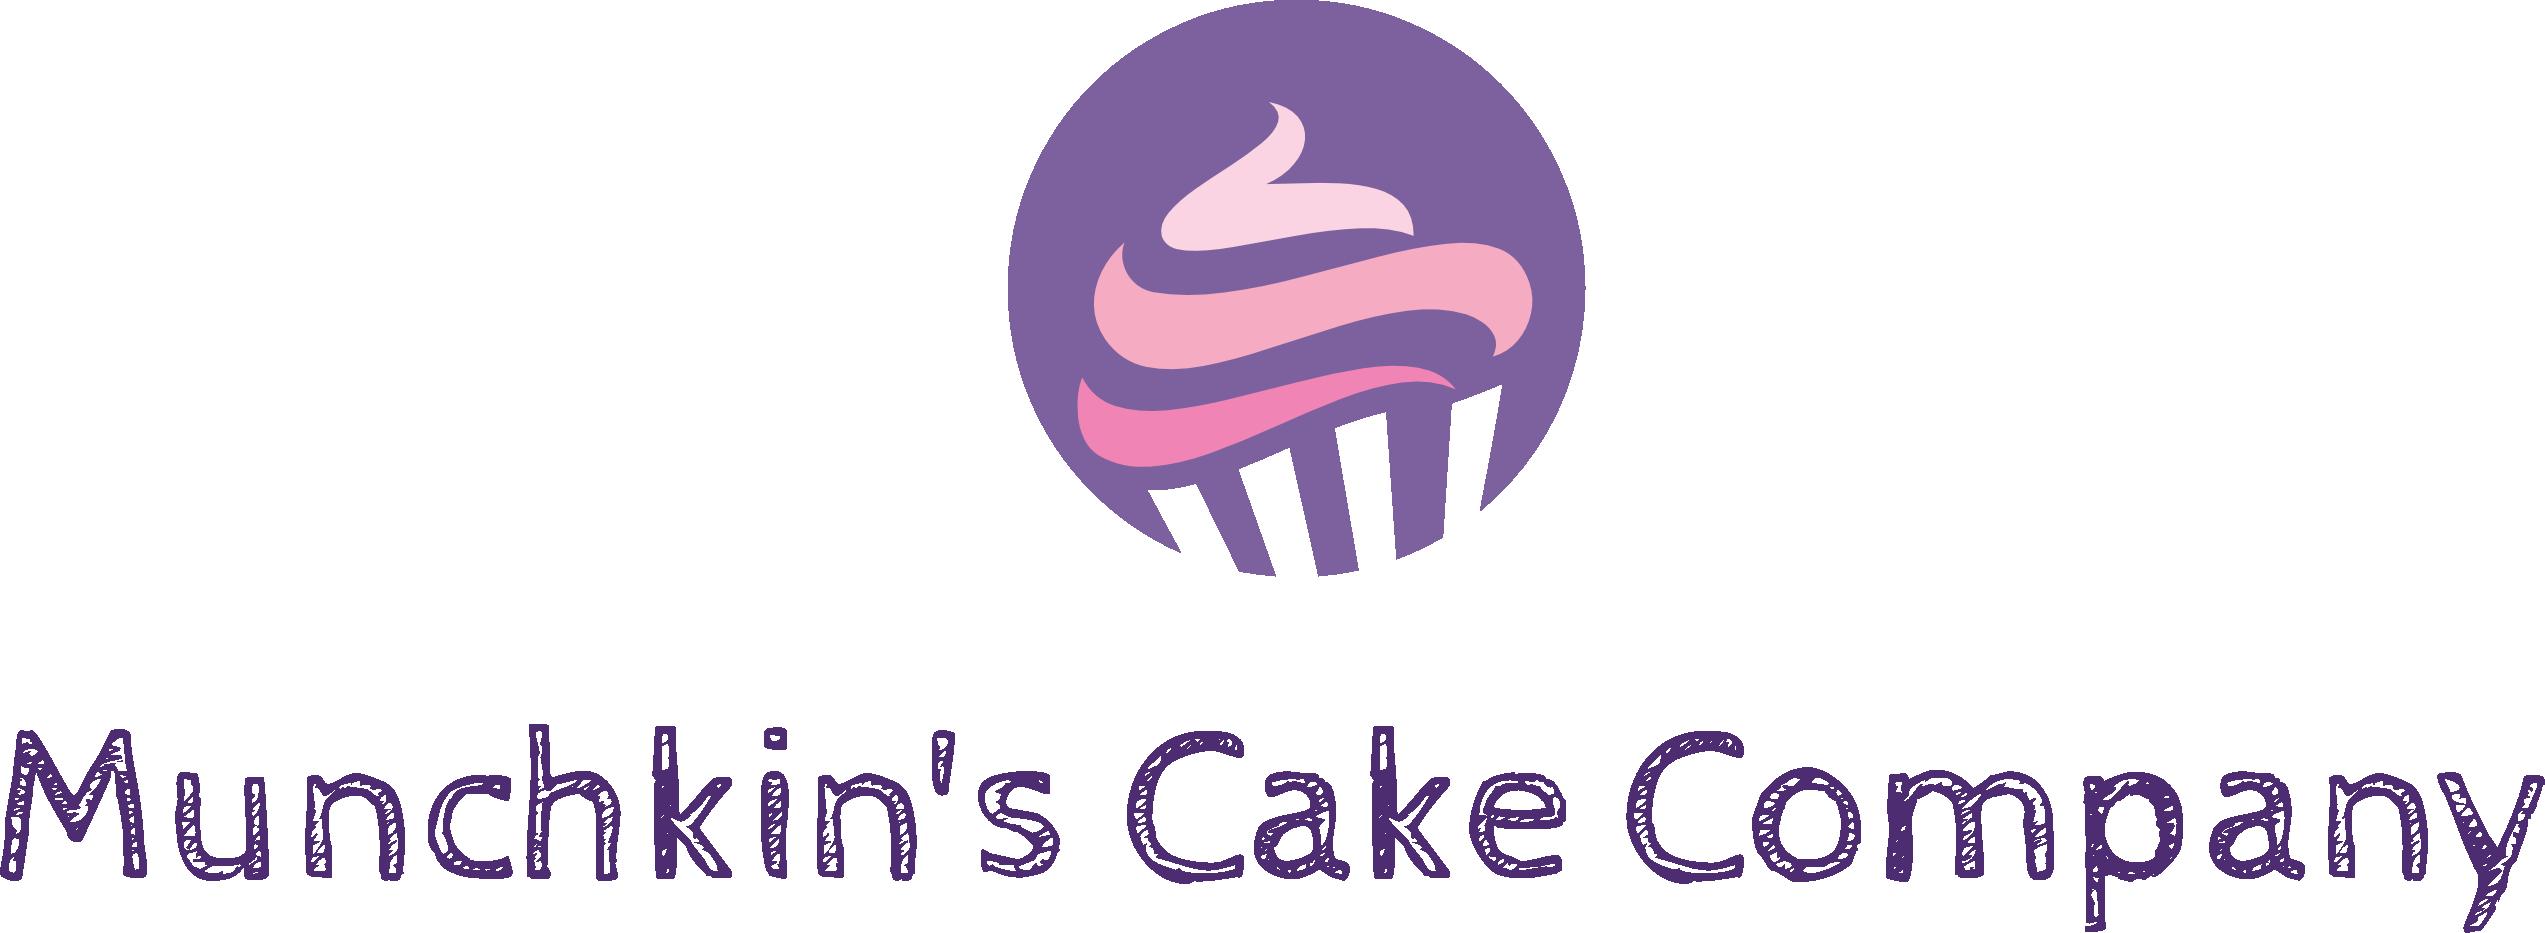 Munchkins Cake Company